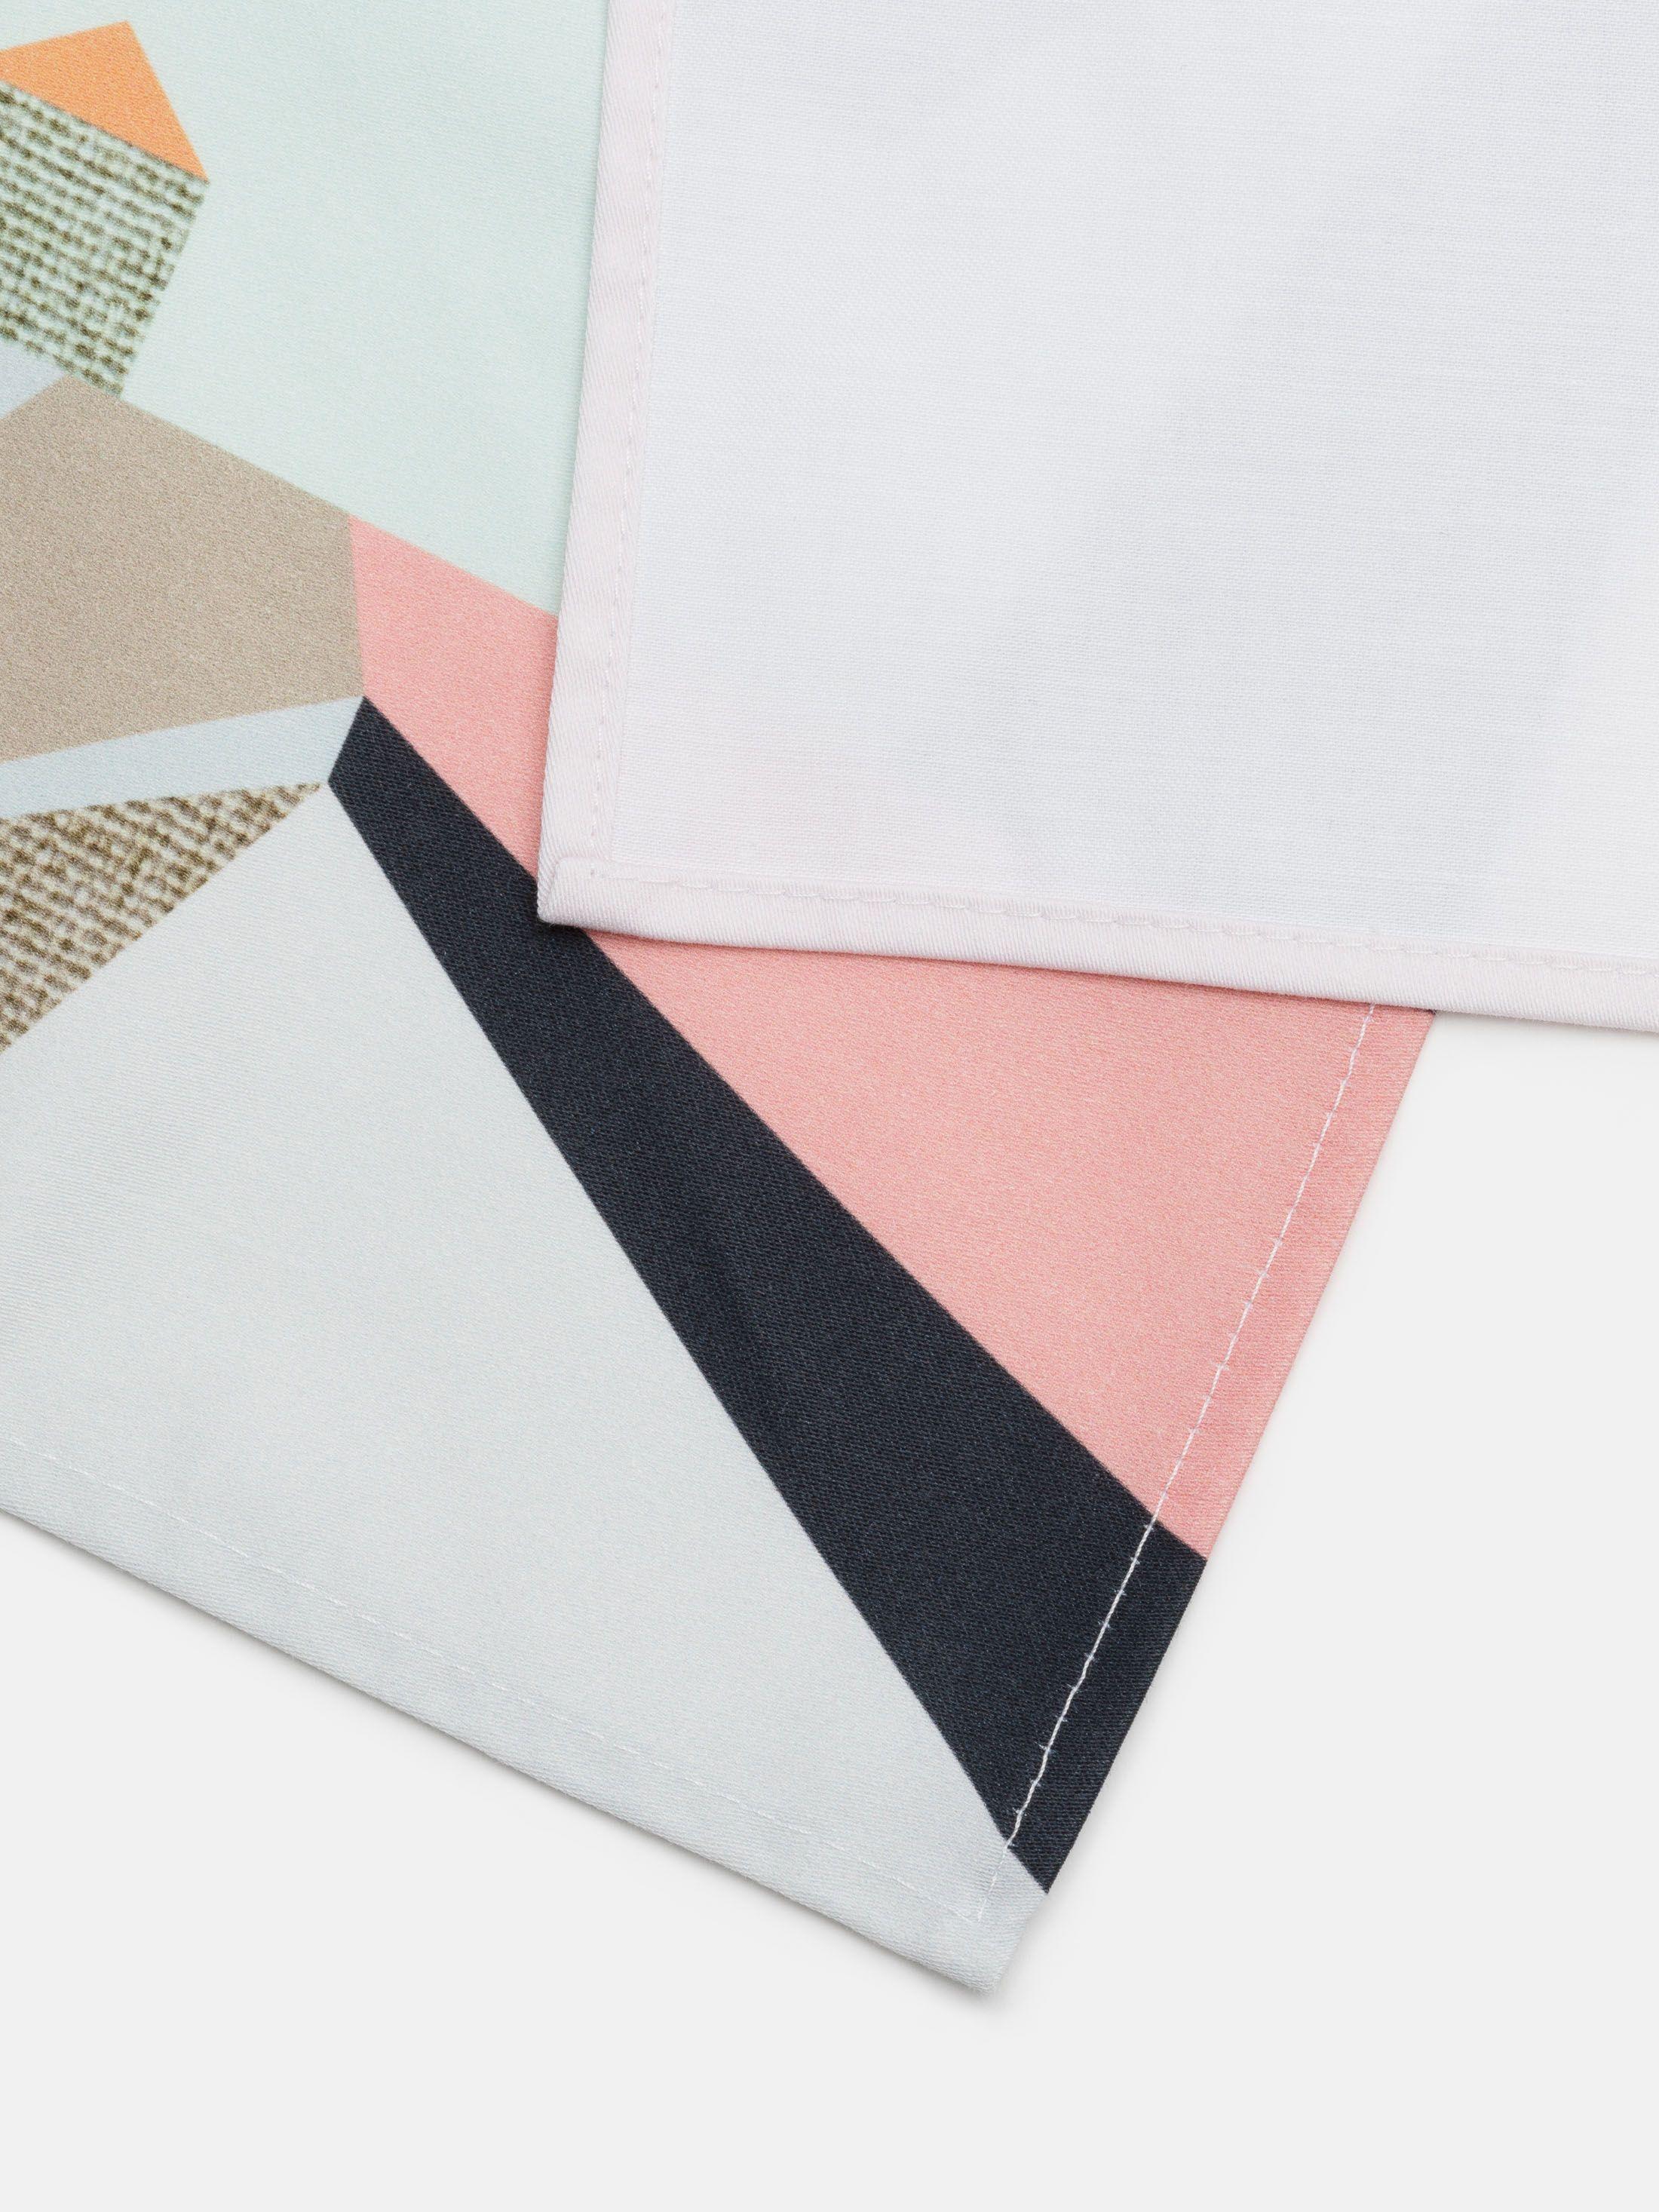 printed napkins edges